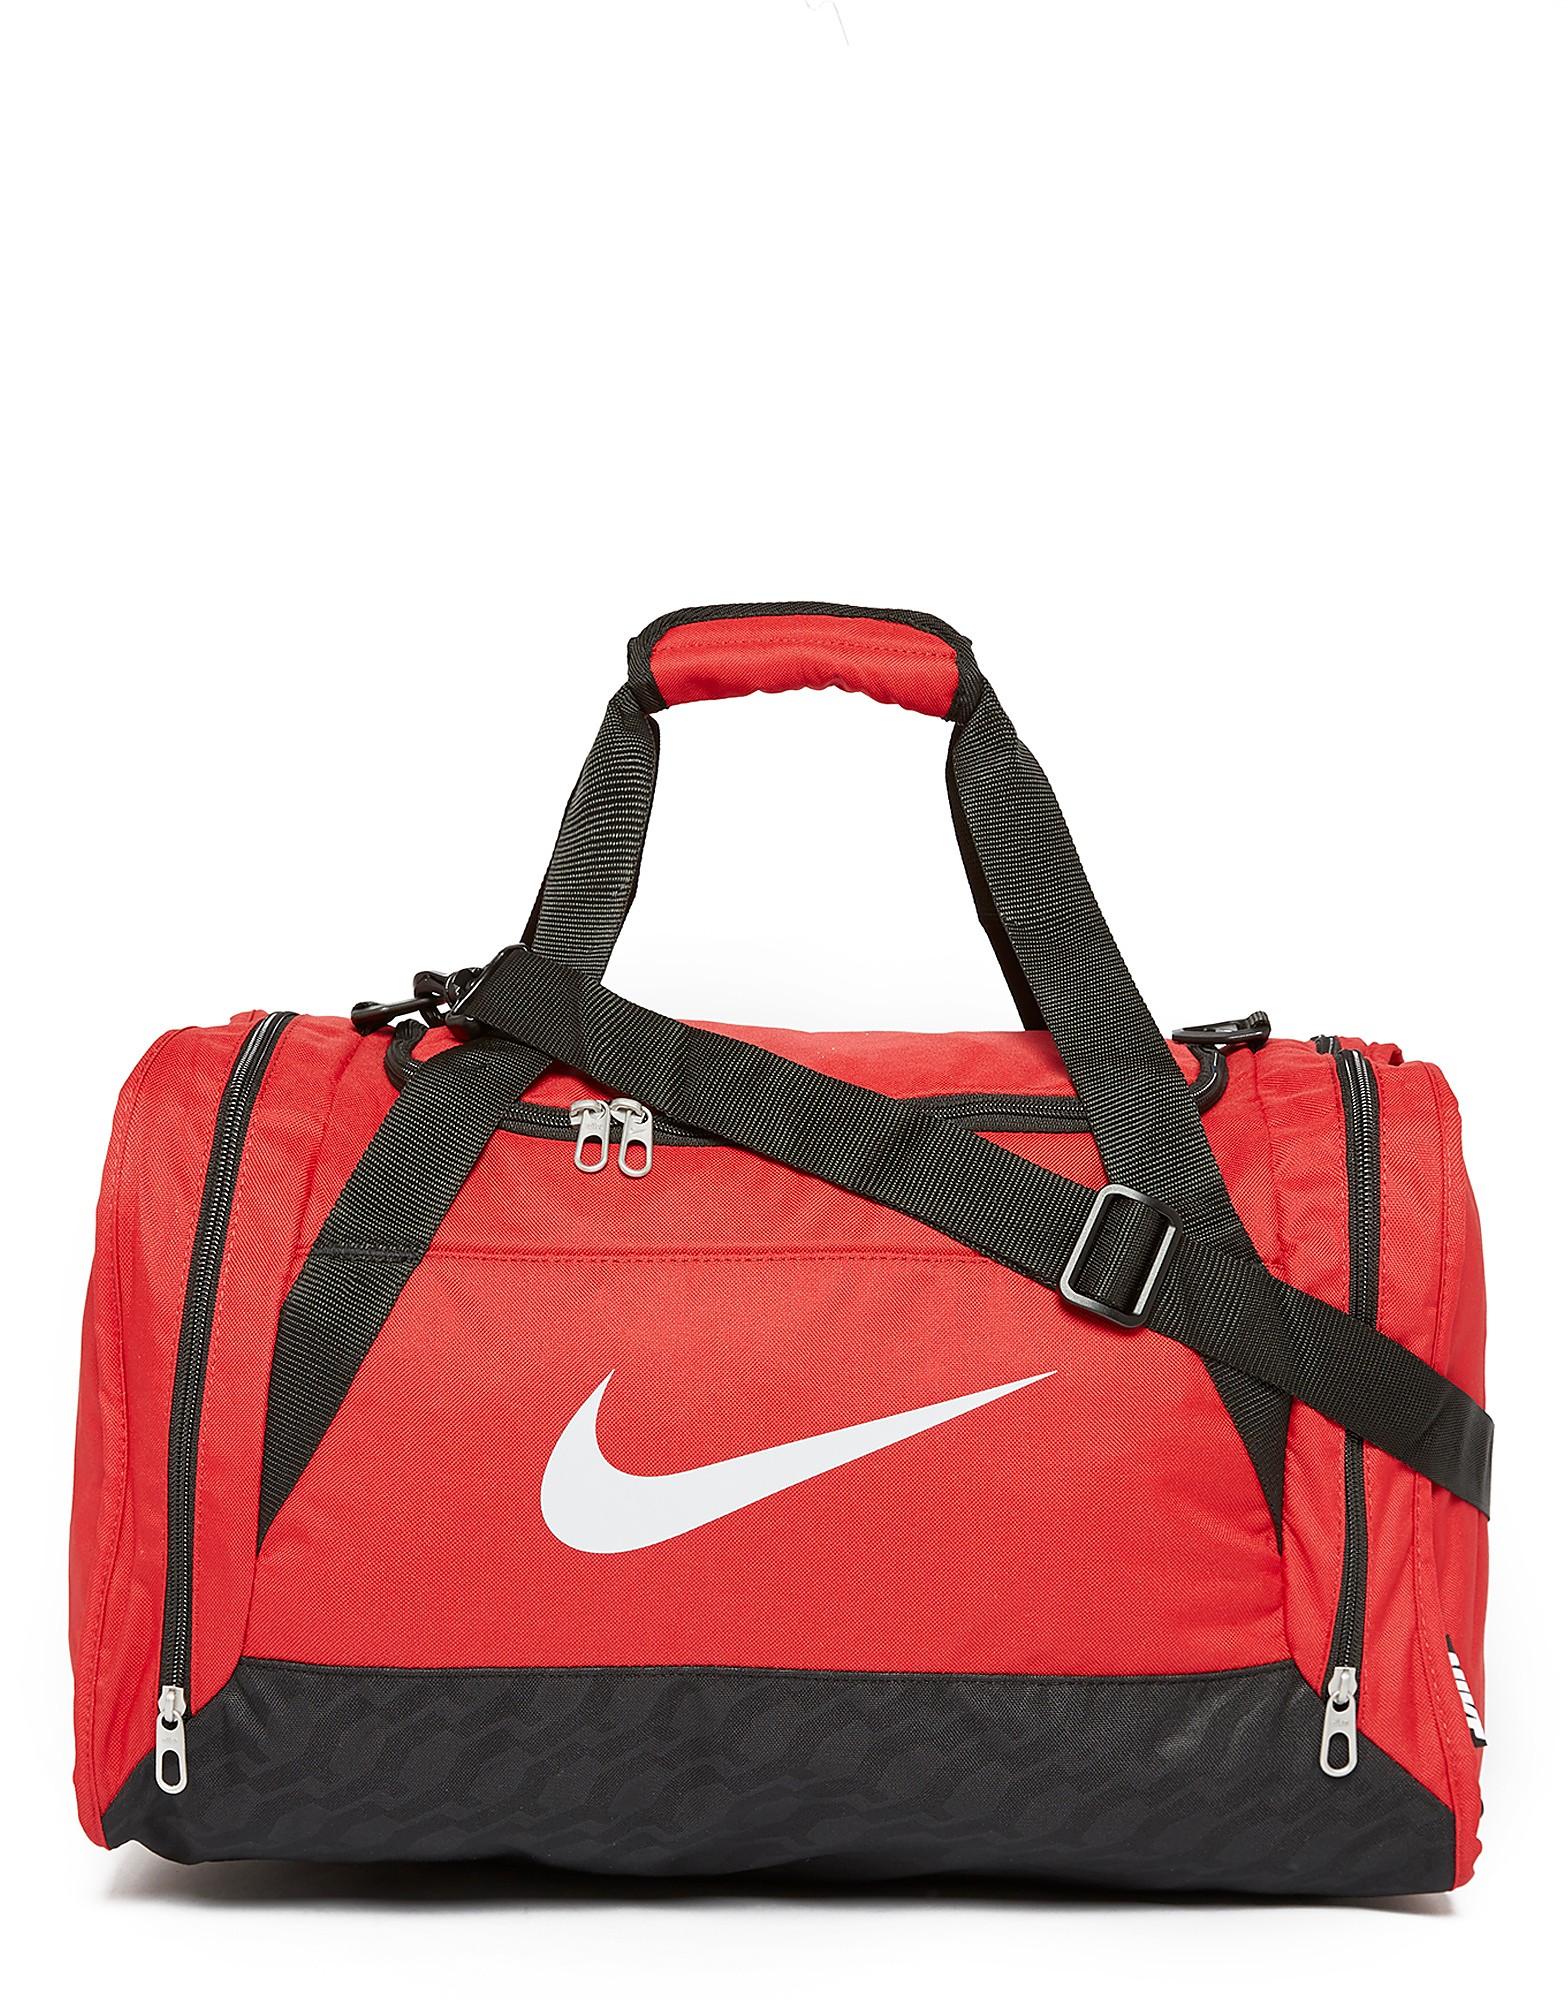 Nike Brasilia Small Duffle Bag